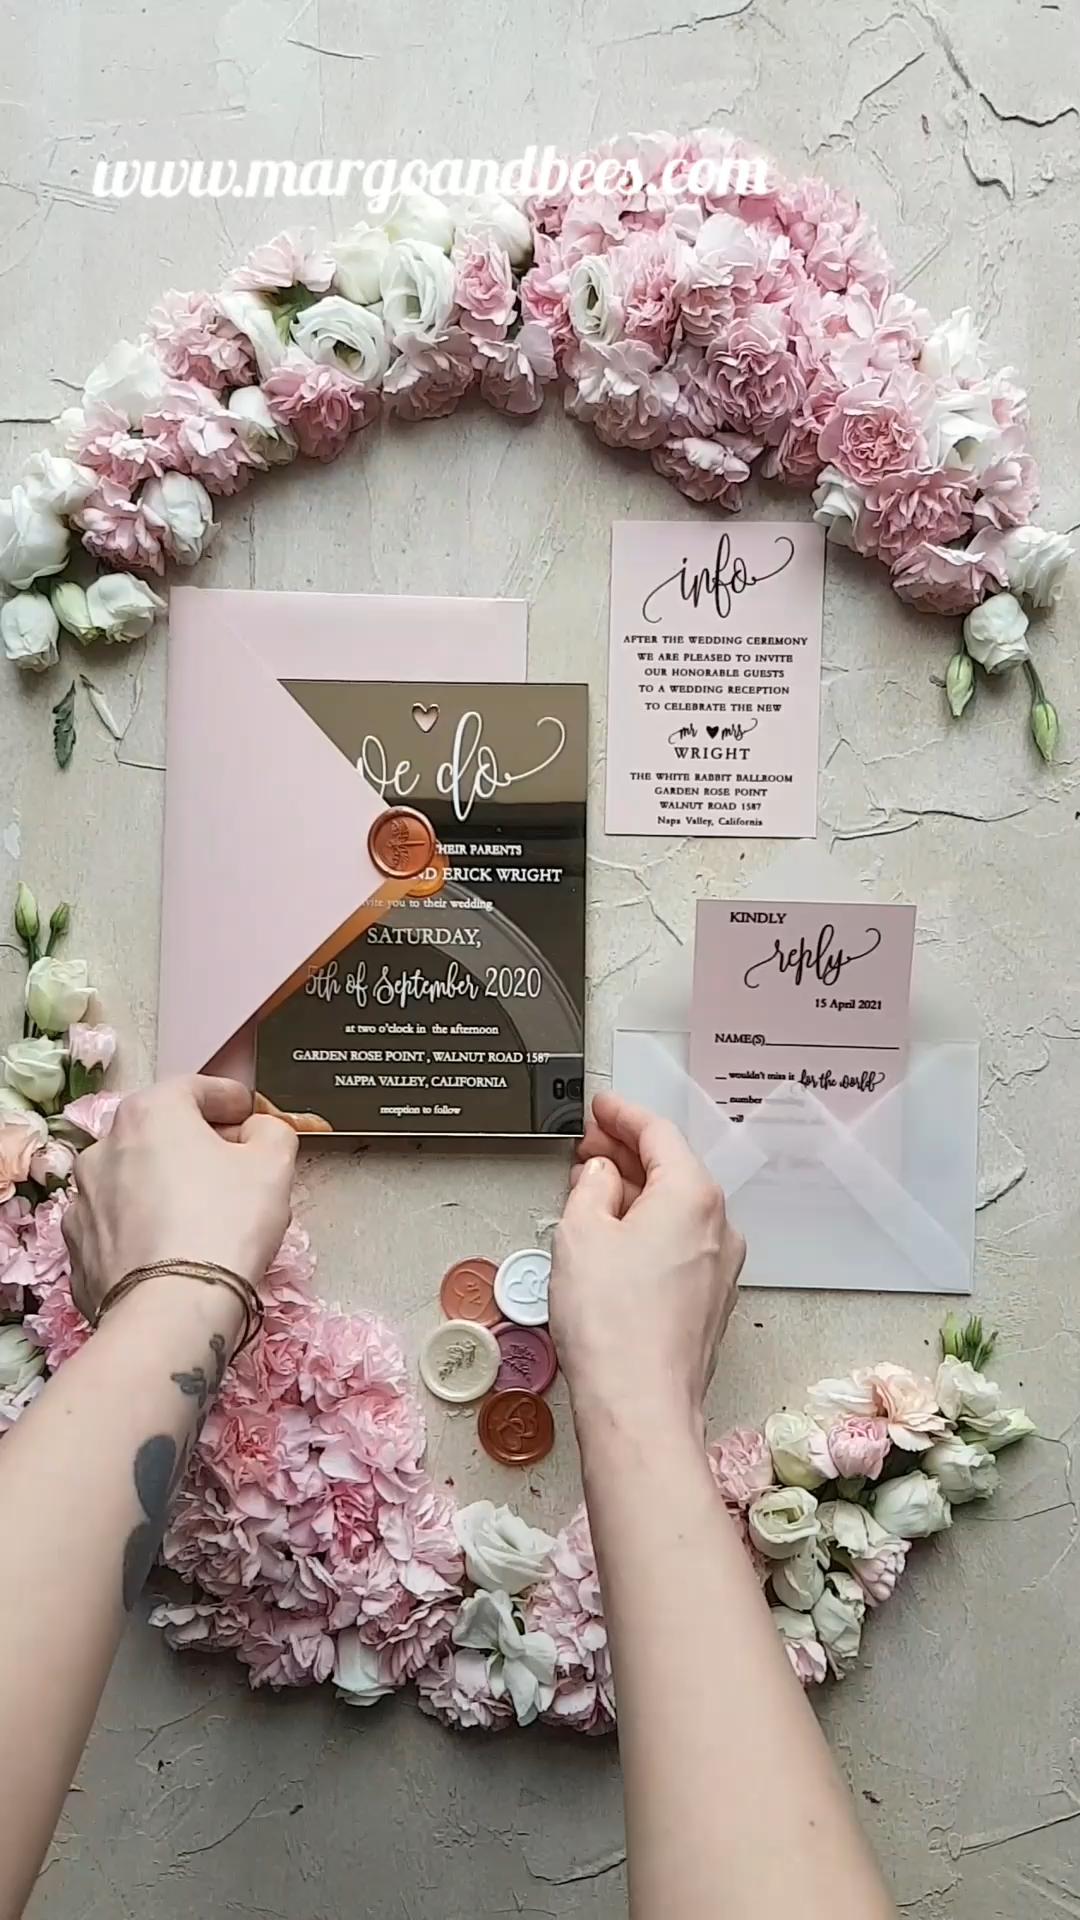 Personalised wedding invitations cards luxury gold mirror acrylic 1/goldak/z